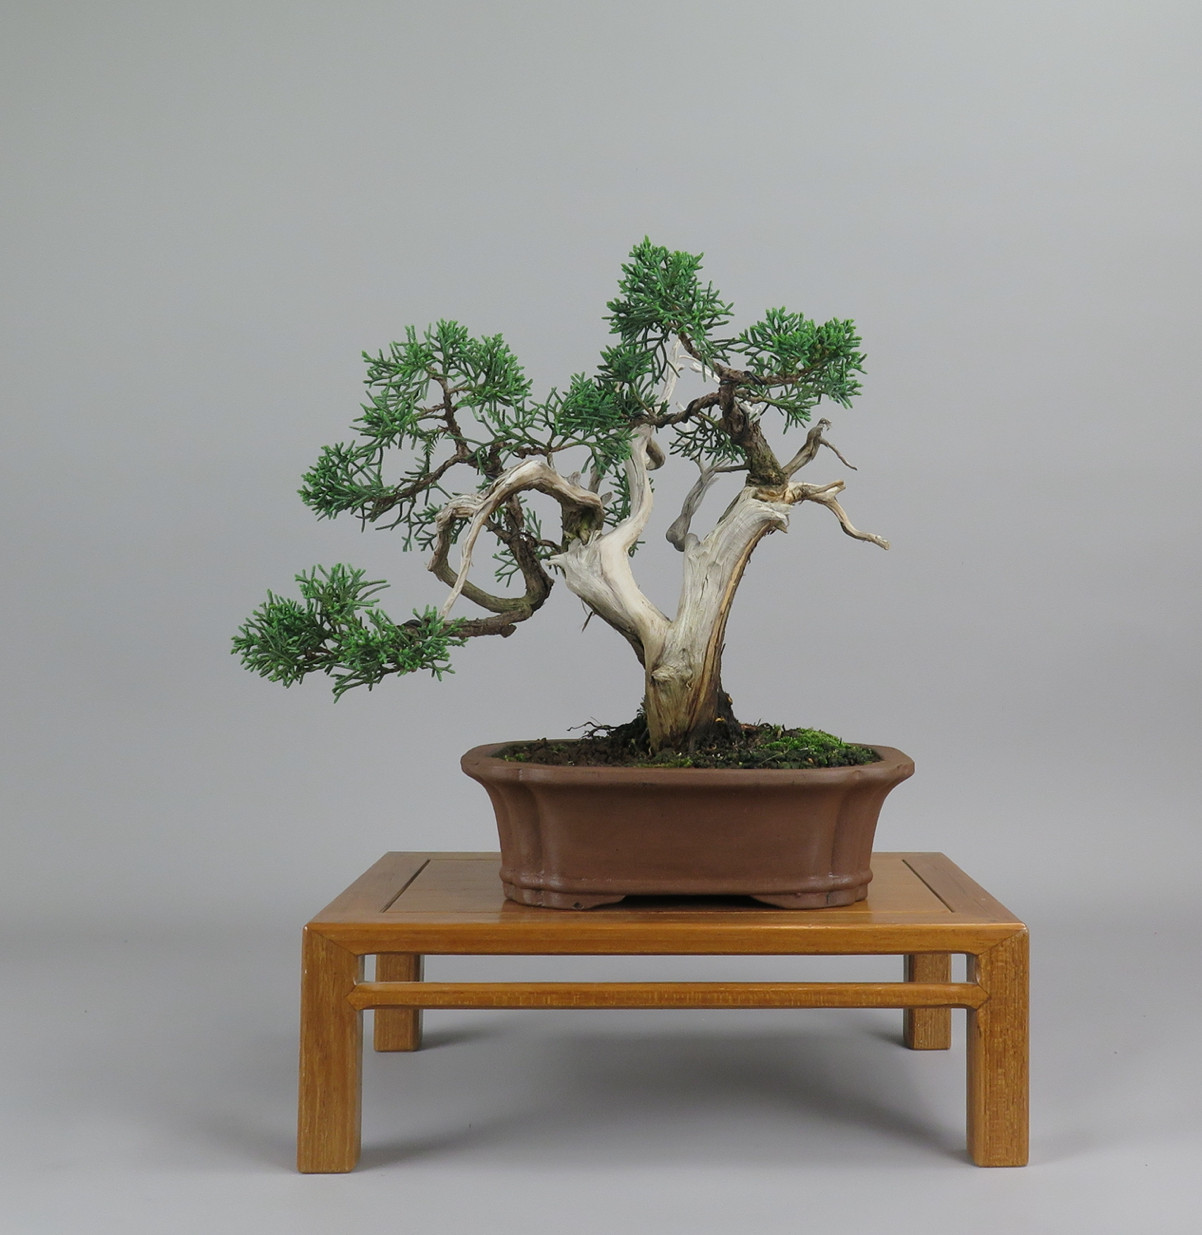 Bonsai de juníperus, frente